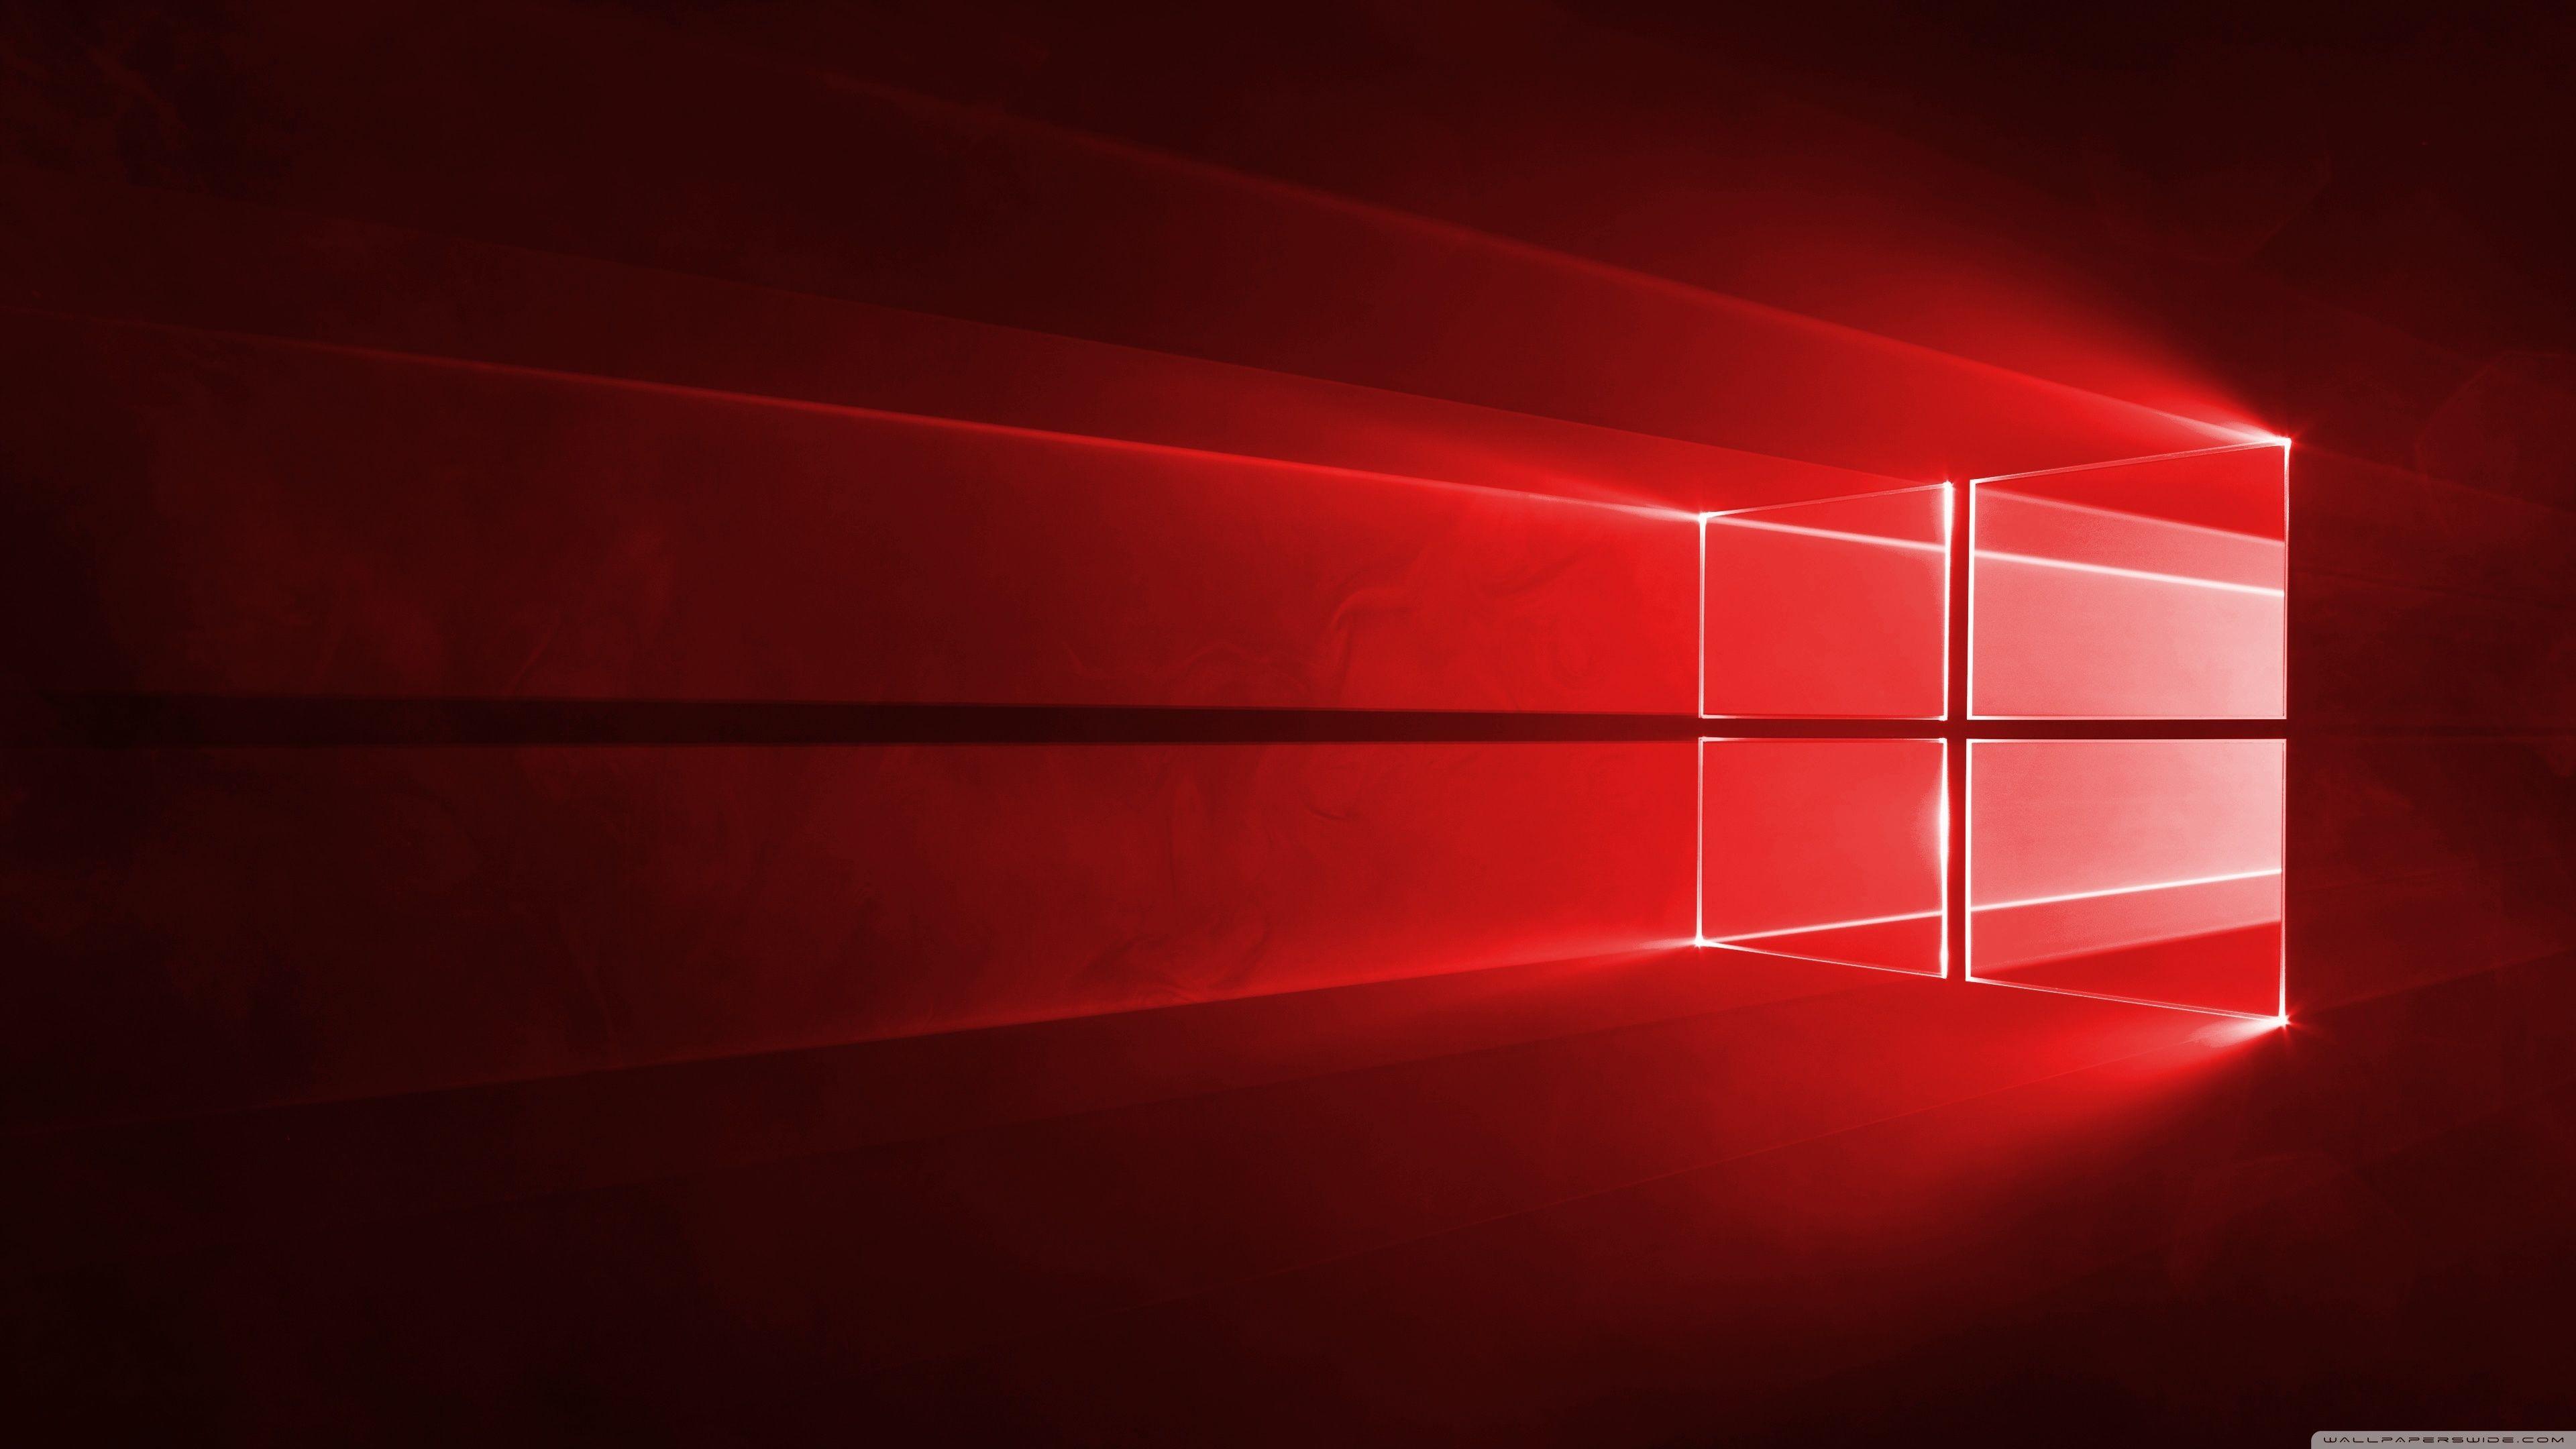 Red Wallpaper For Desktop 73 Pictures